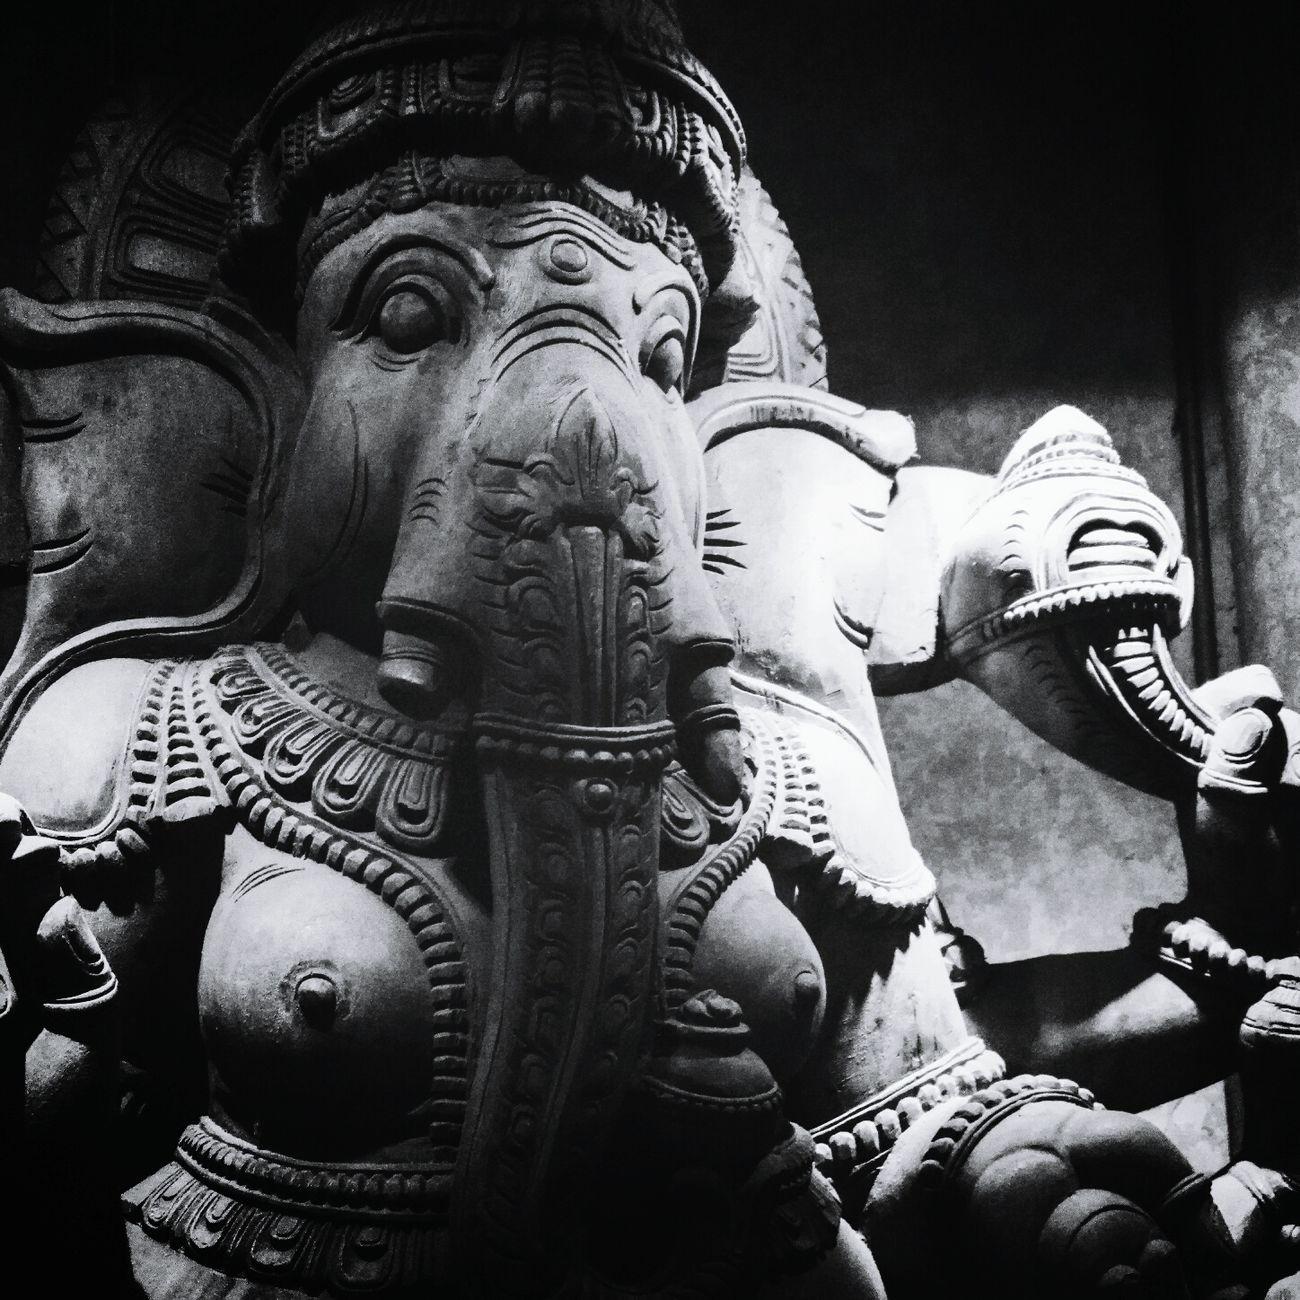 Ganesha Ganesh India Deity Sculpture Statue Elephant